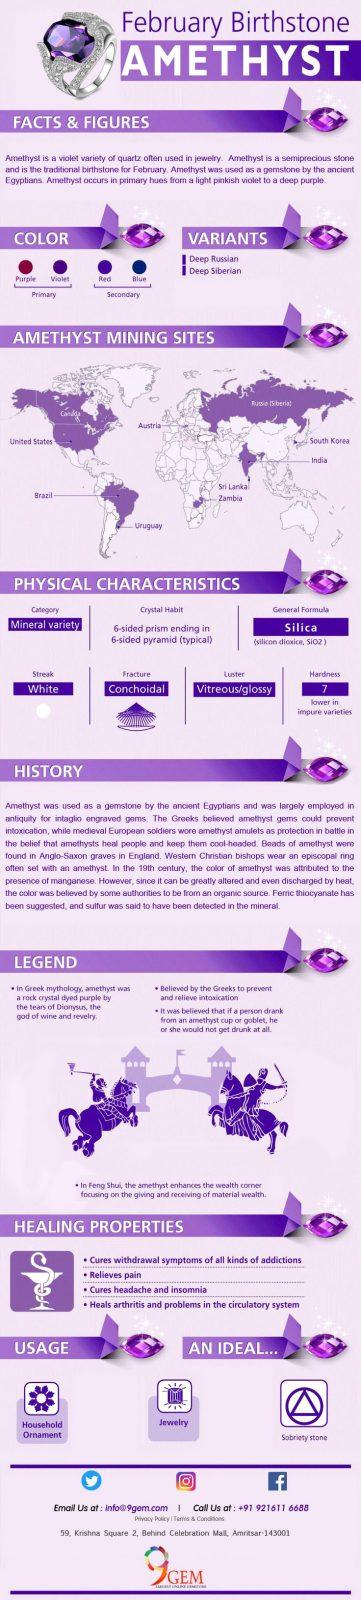 Amethyst Gemstone: Facts, Properties, Usage, Origins